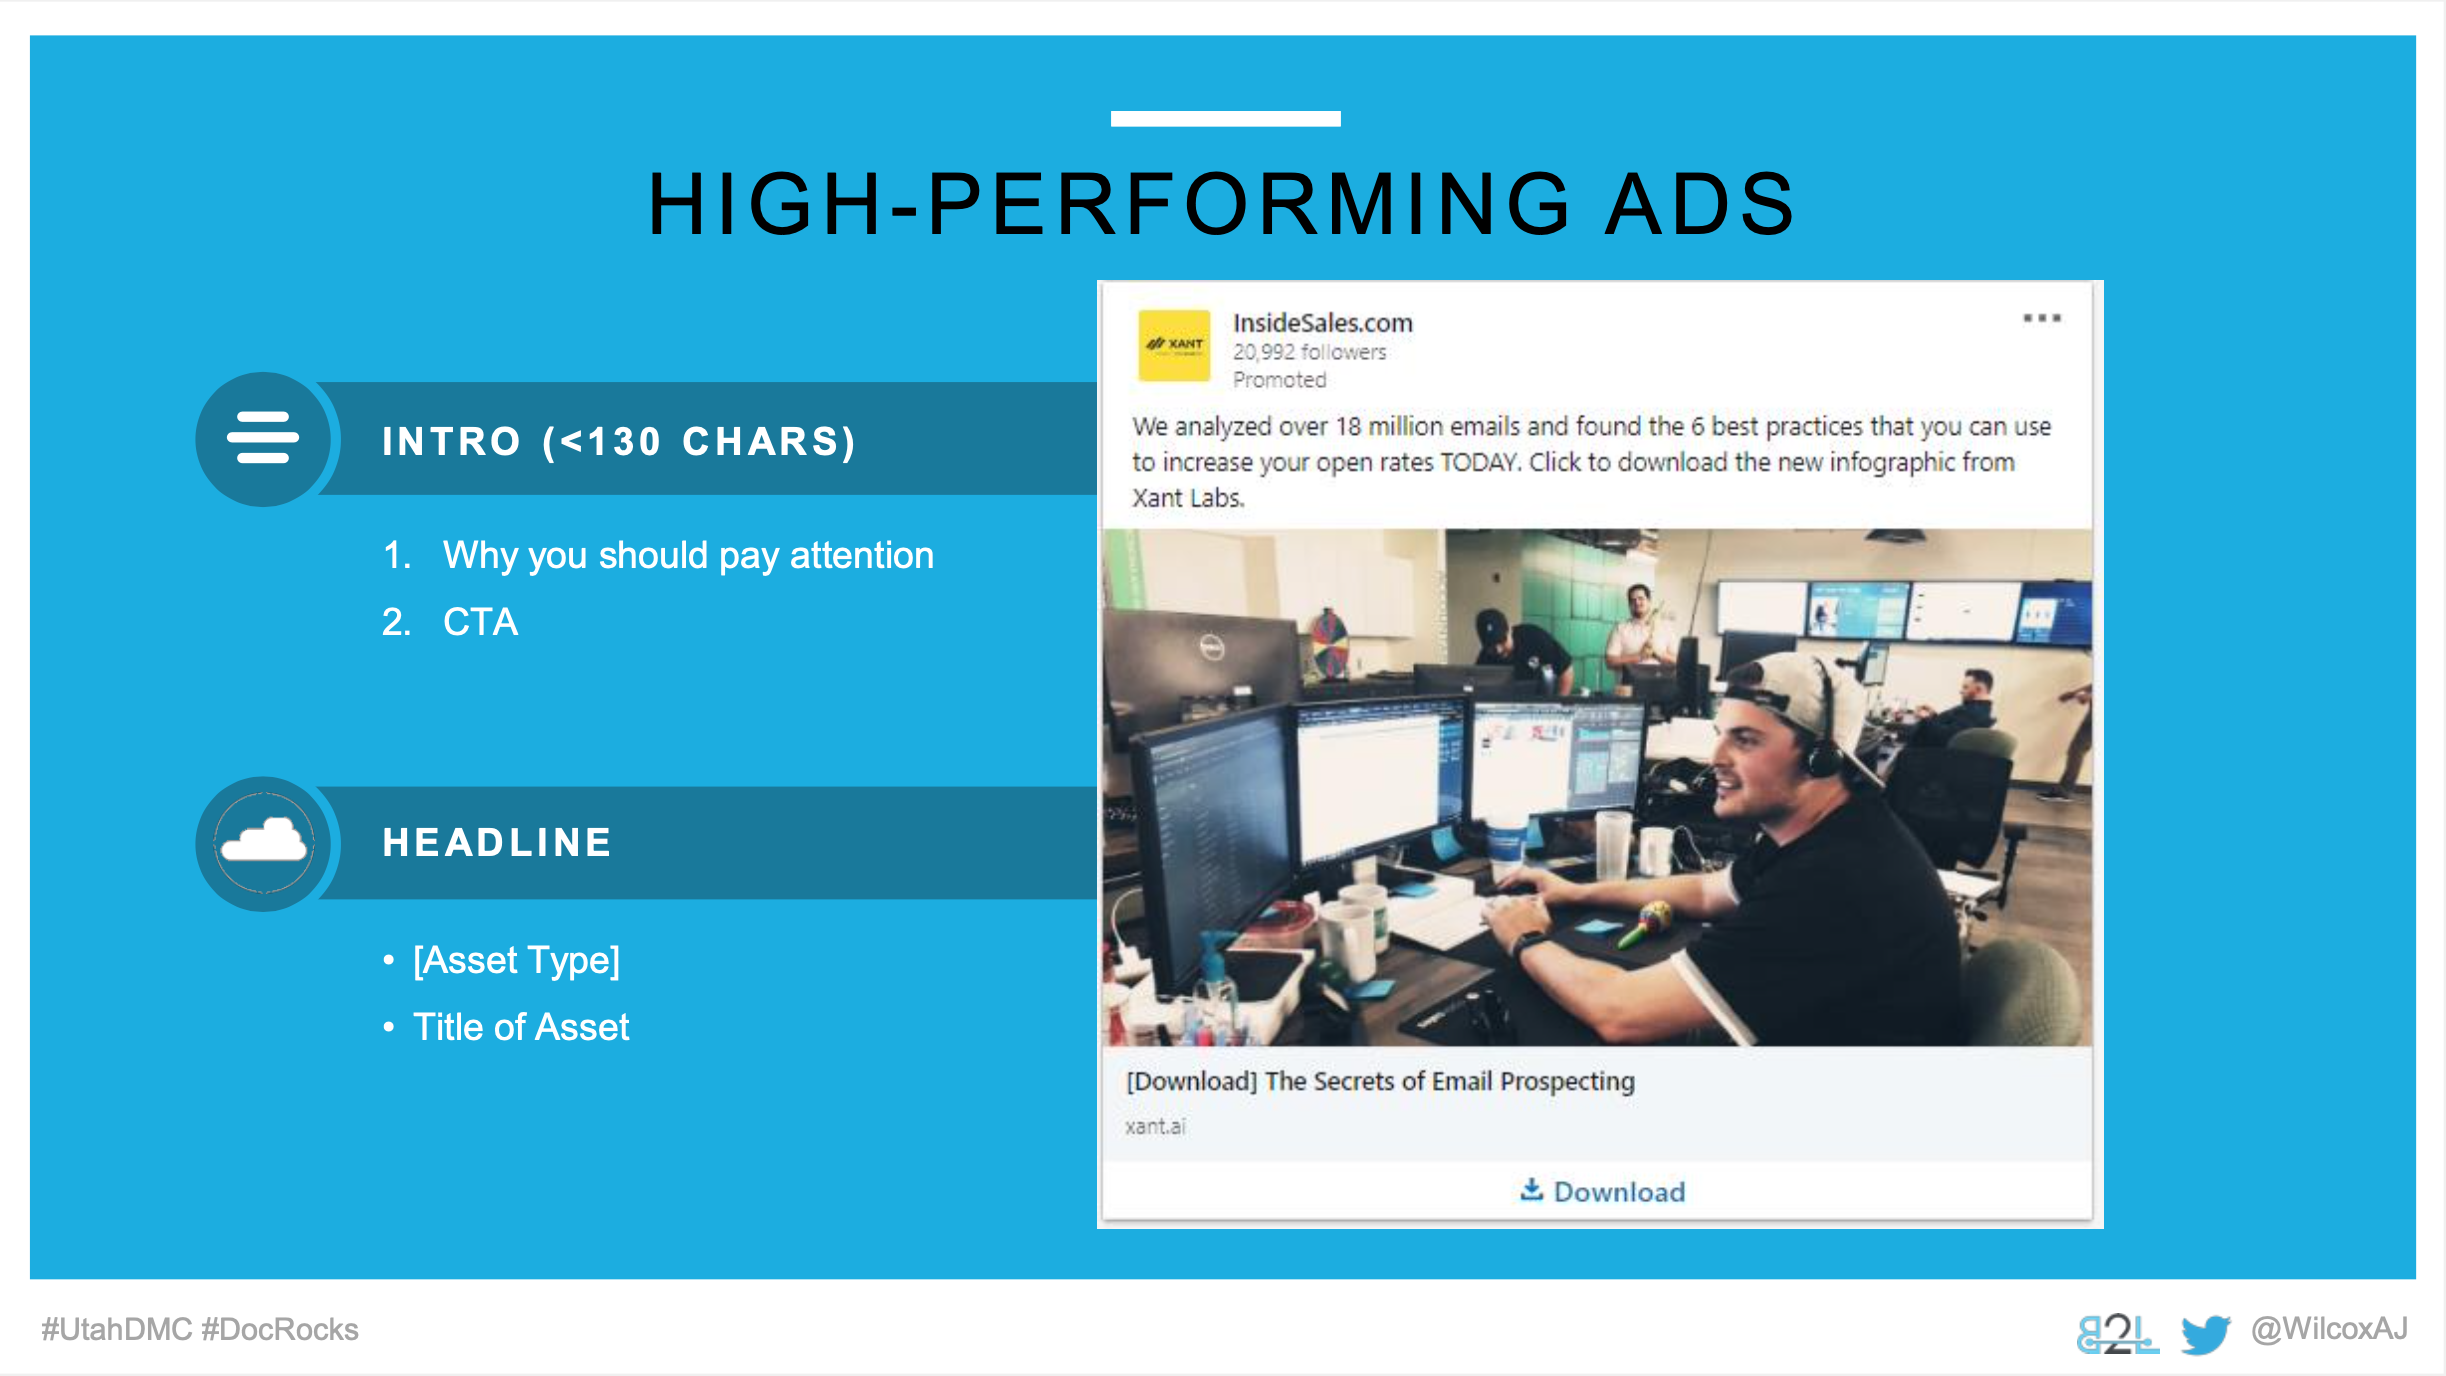 Utah DMC LinkedIn Ads - Aj Wilcox - Ad Units - High-Performing Ads